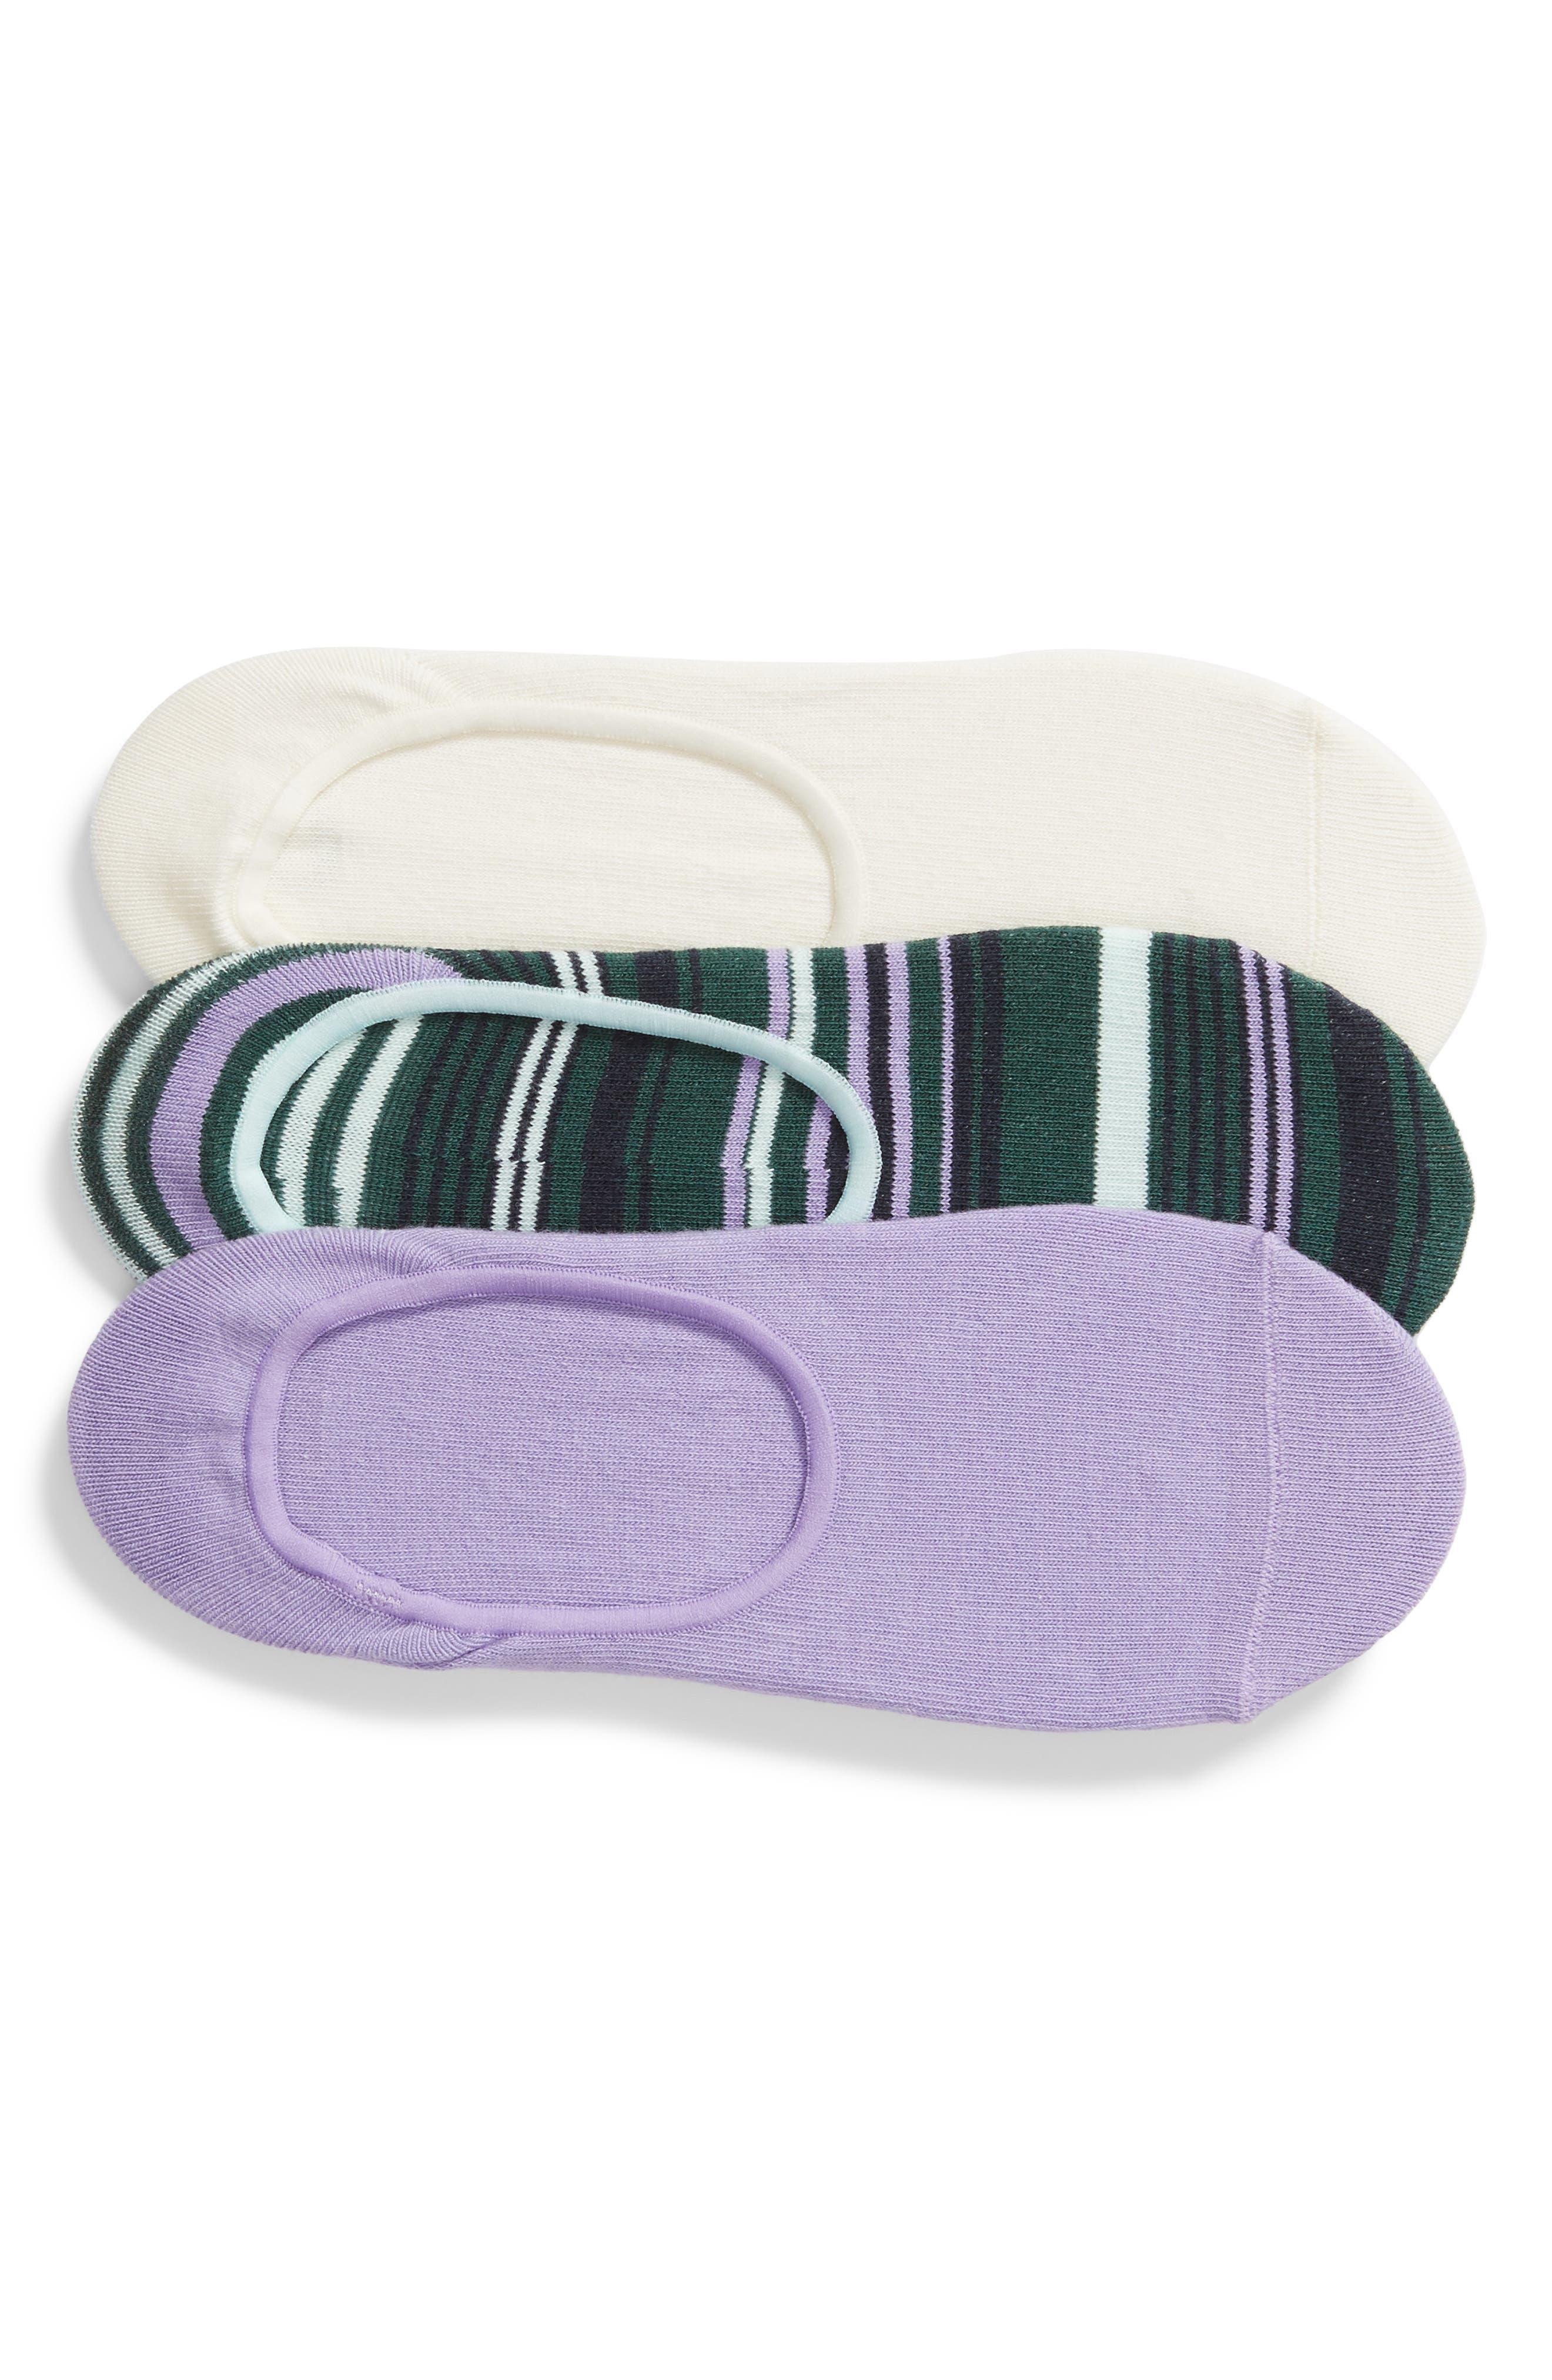 NORDSTROM,                             3-Pack No-Show Liner Socks,                             Main thumbnail 1, color,                             PURPLE MITTEN MULTI